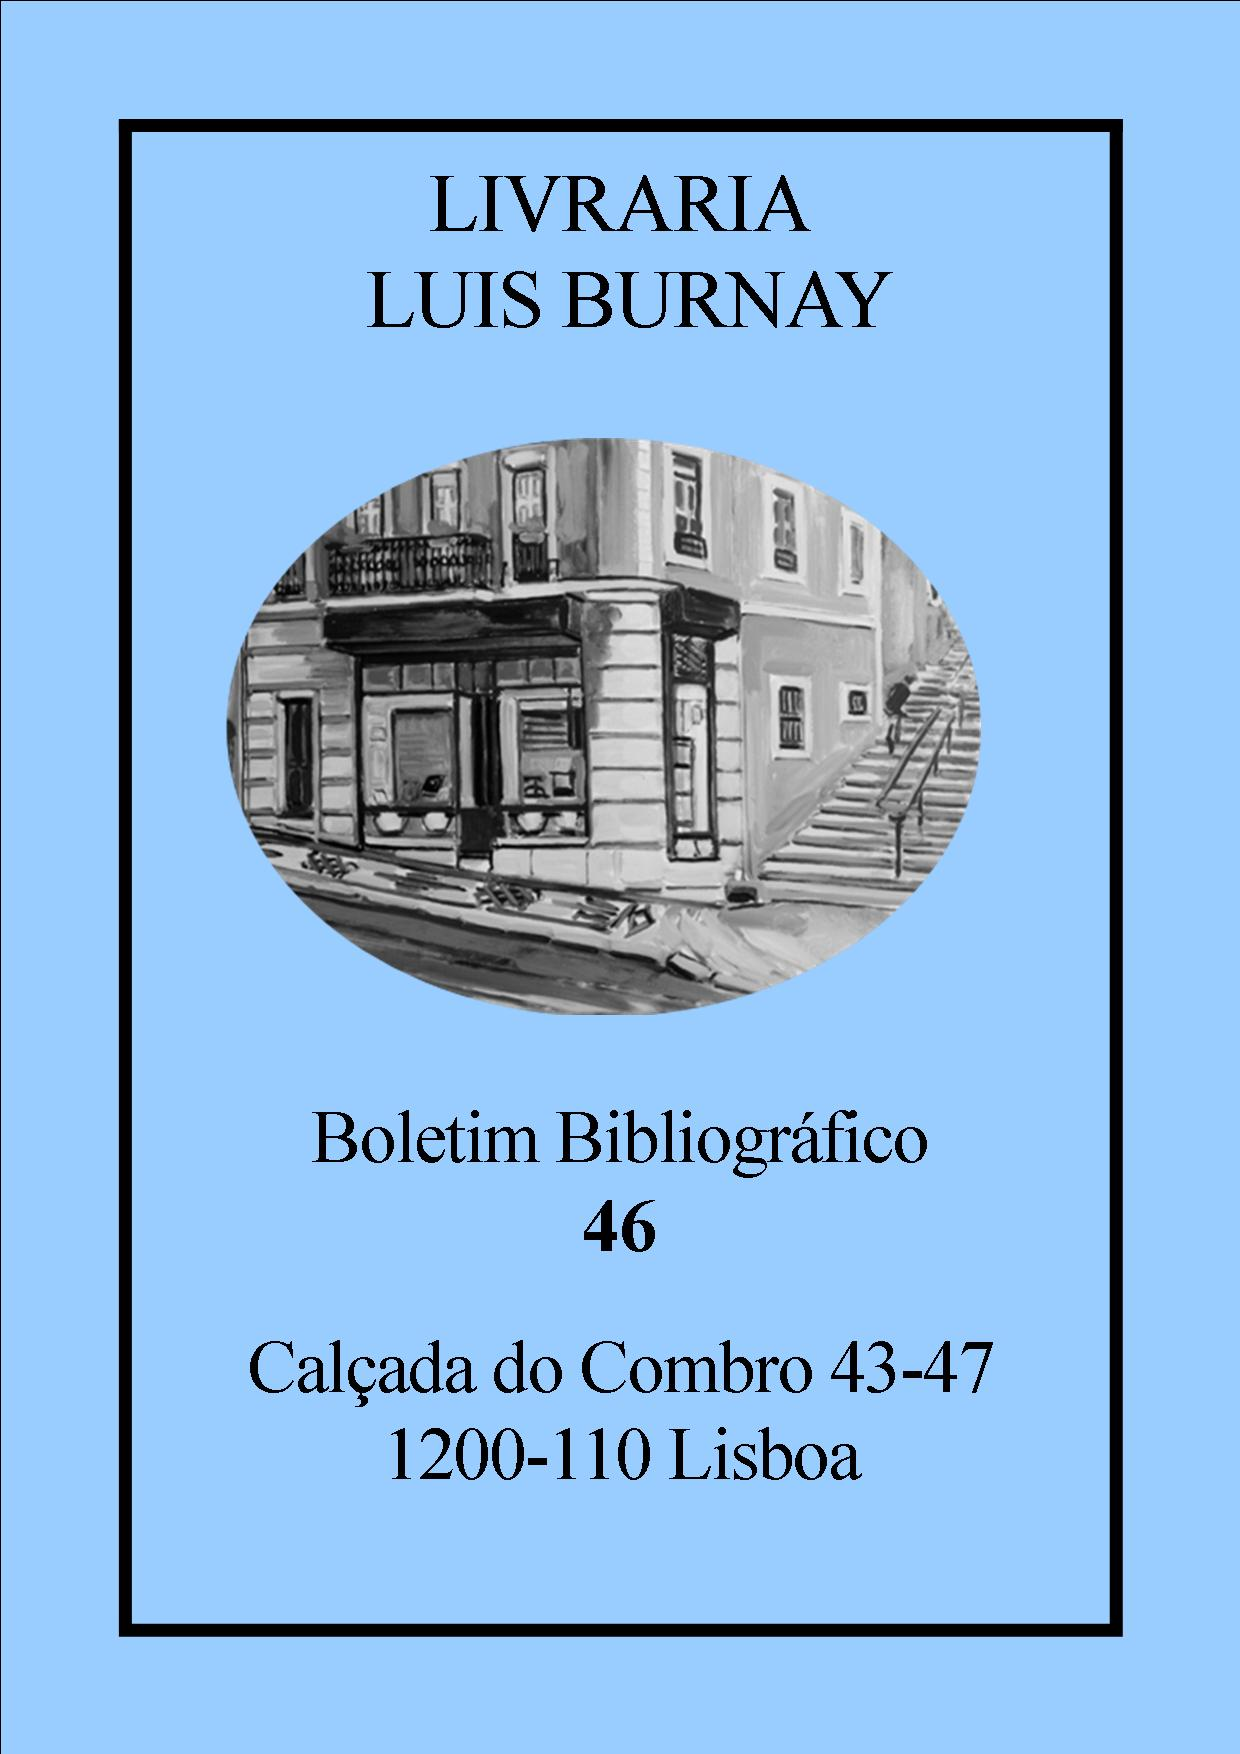 Boletim Bibliográfico nº 46